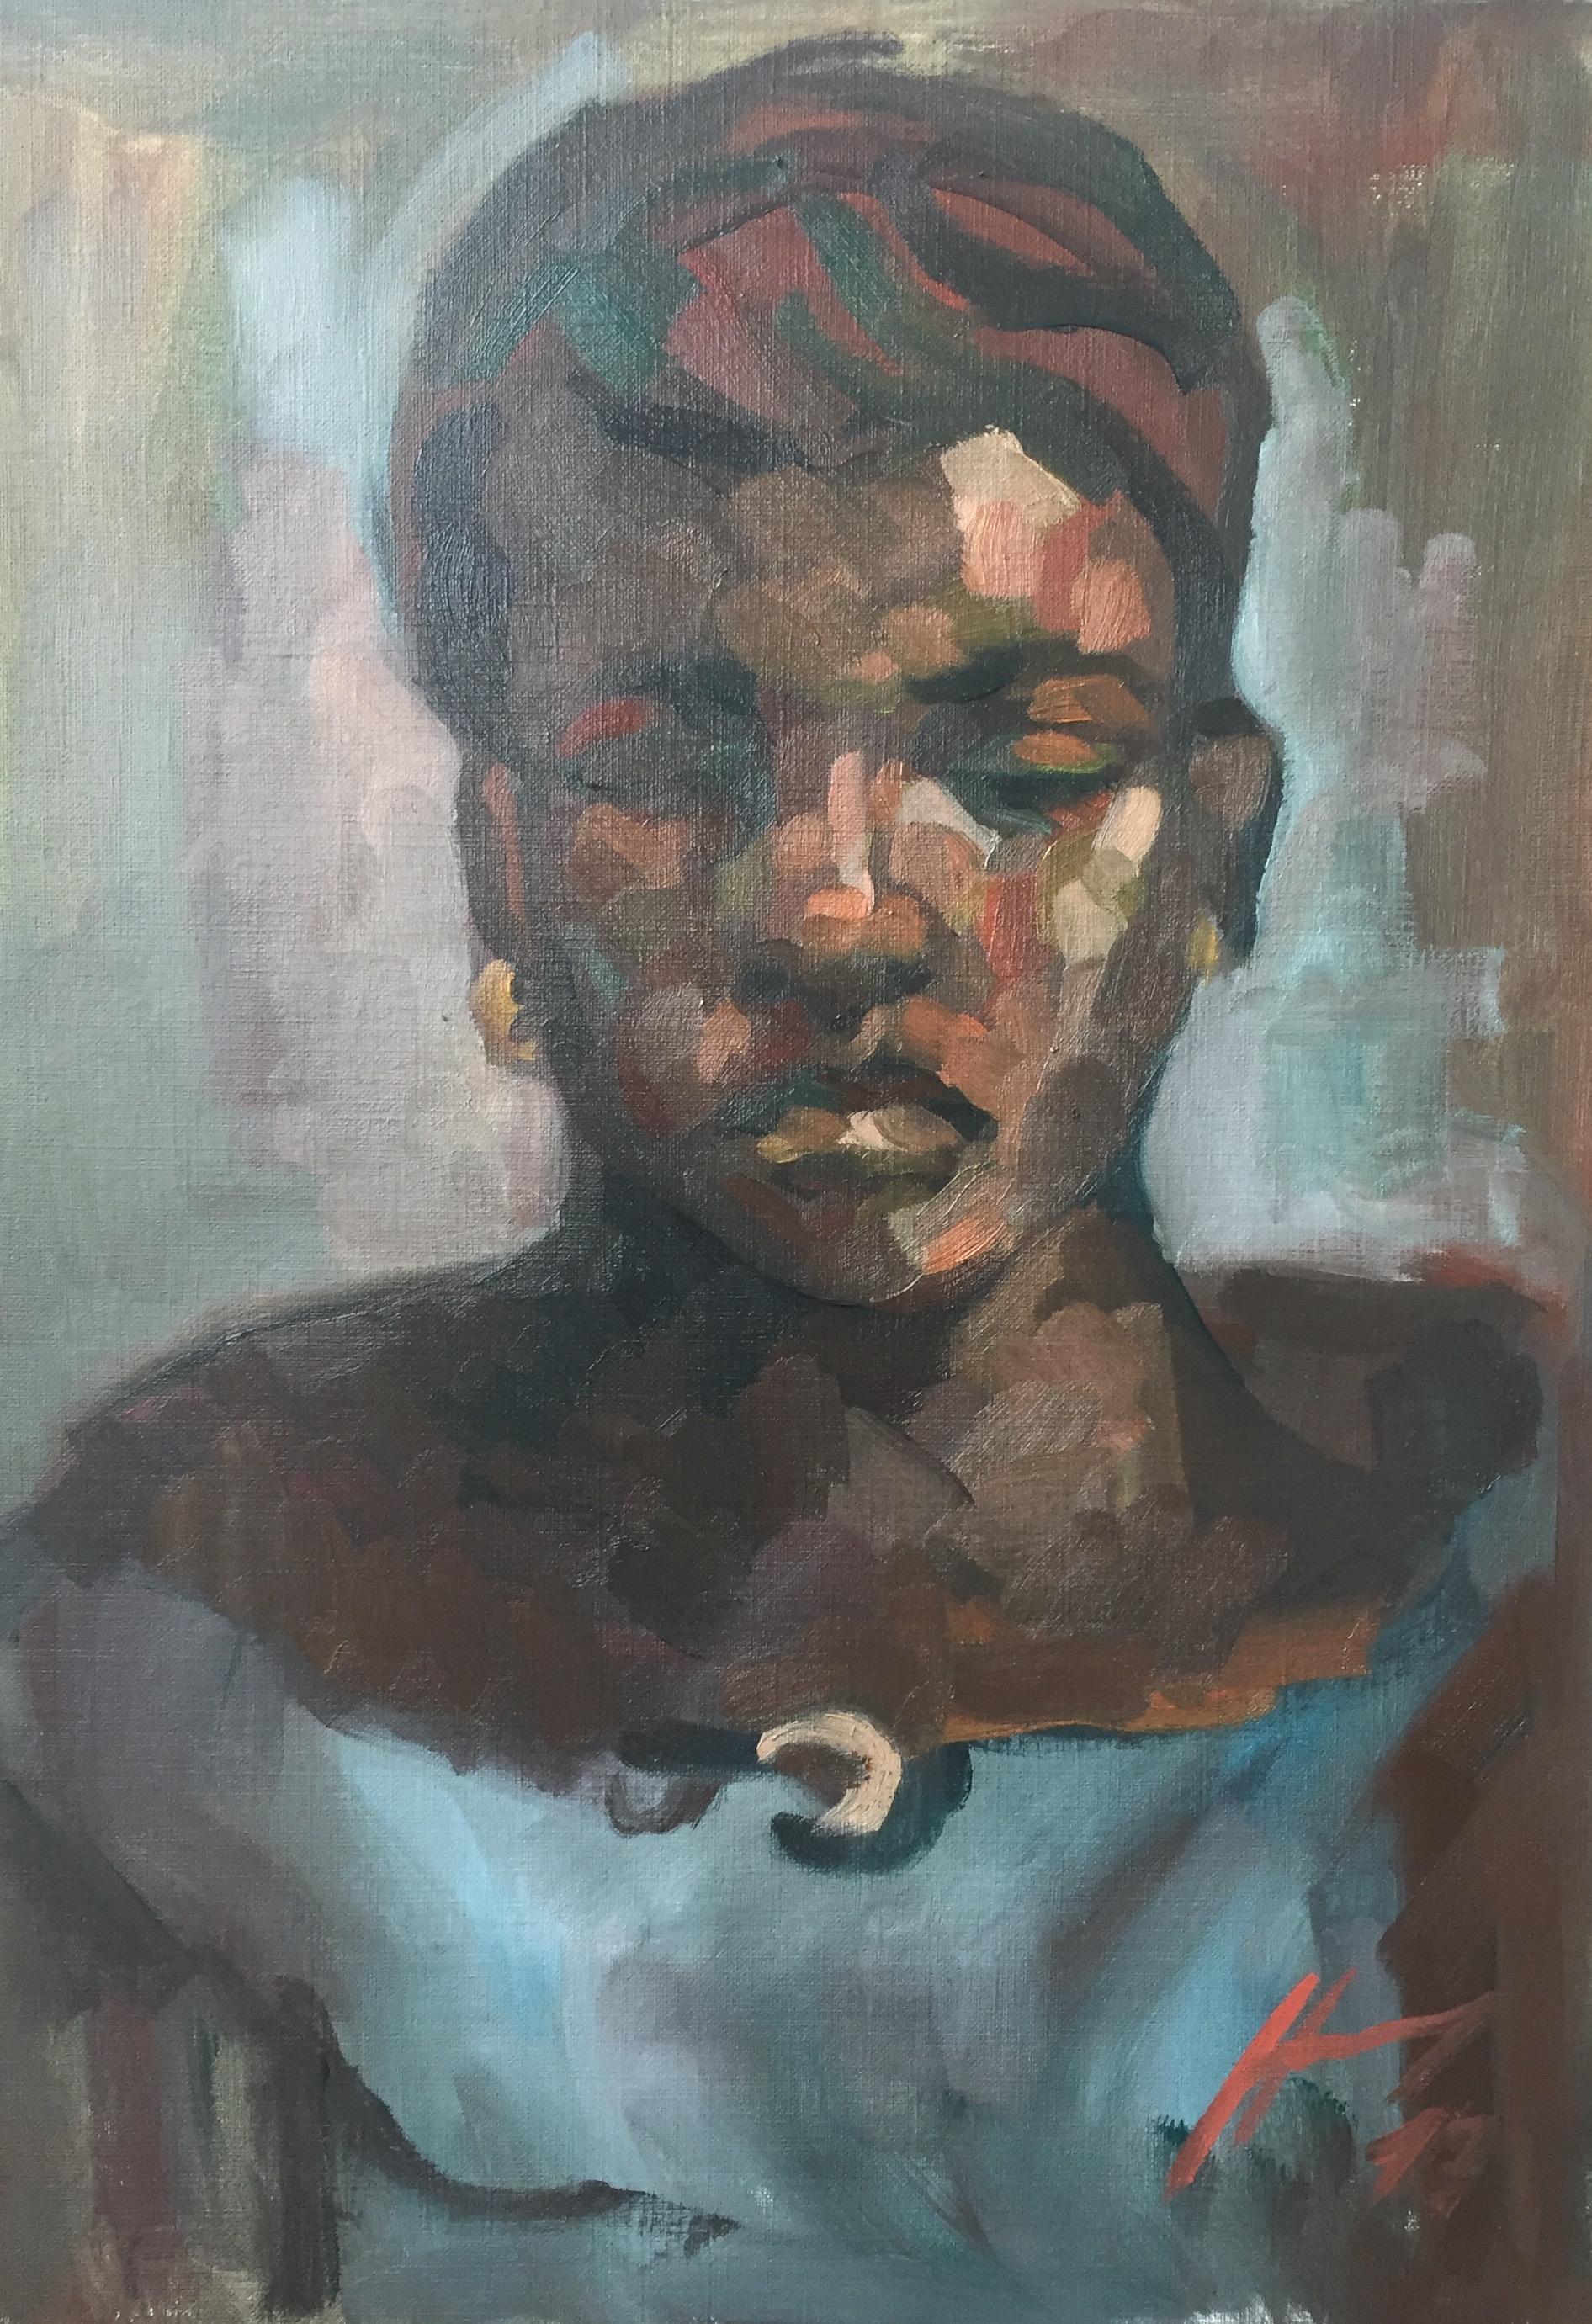 Portrait 7 : Bamako Mali peinture à l'huile